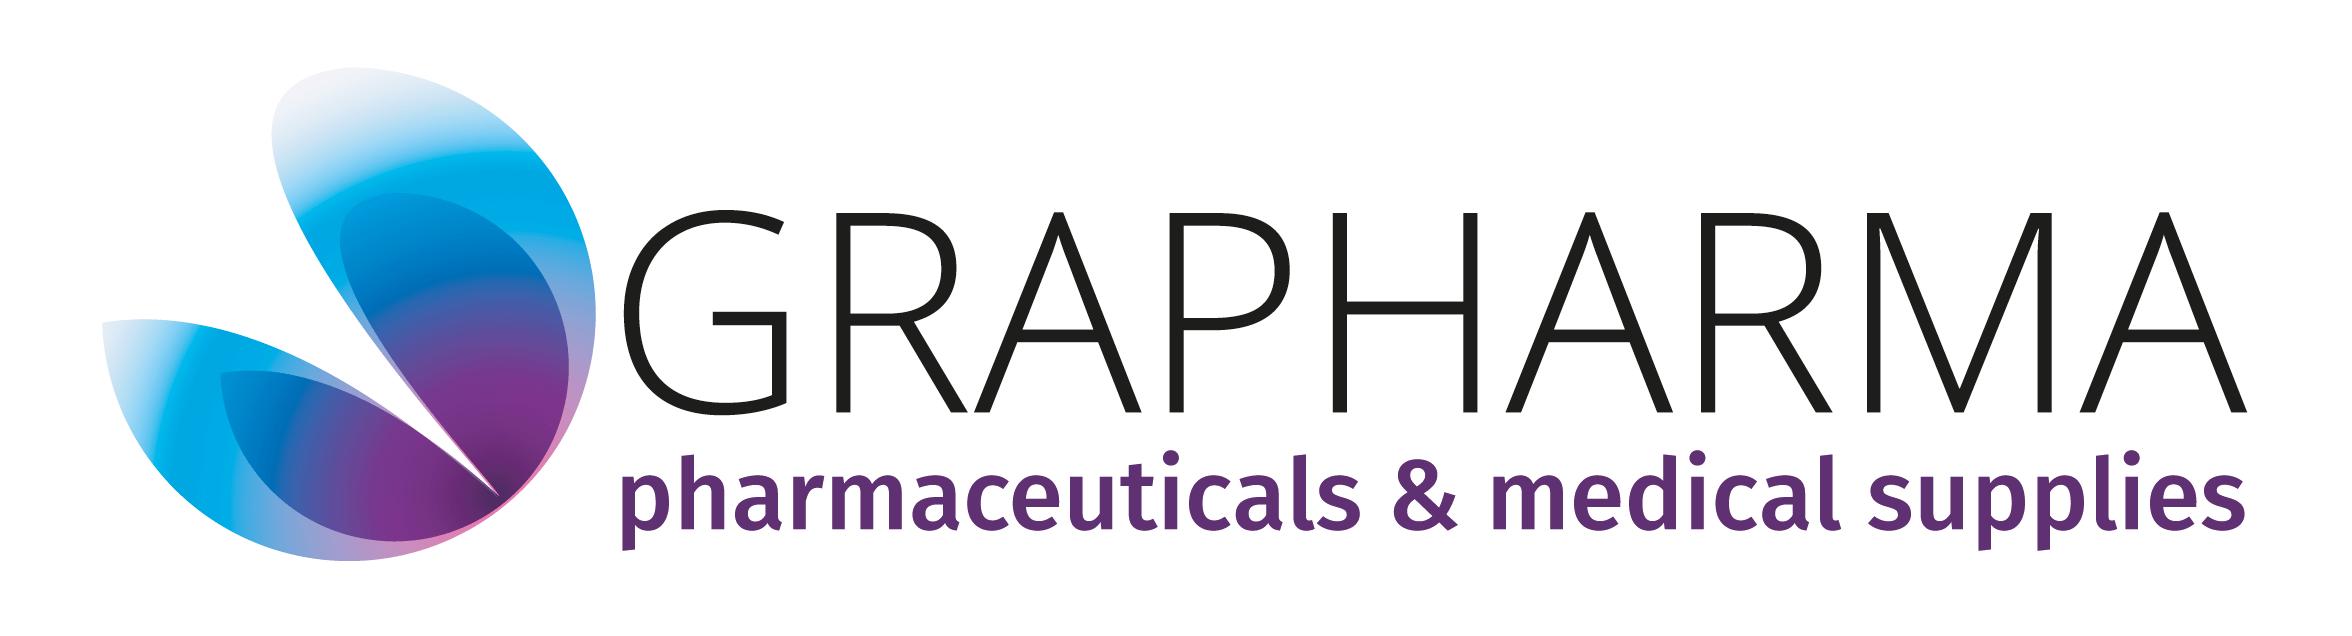 Grapharma_logo_2